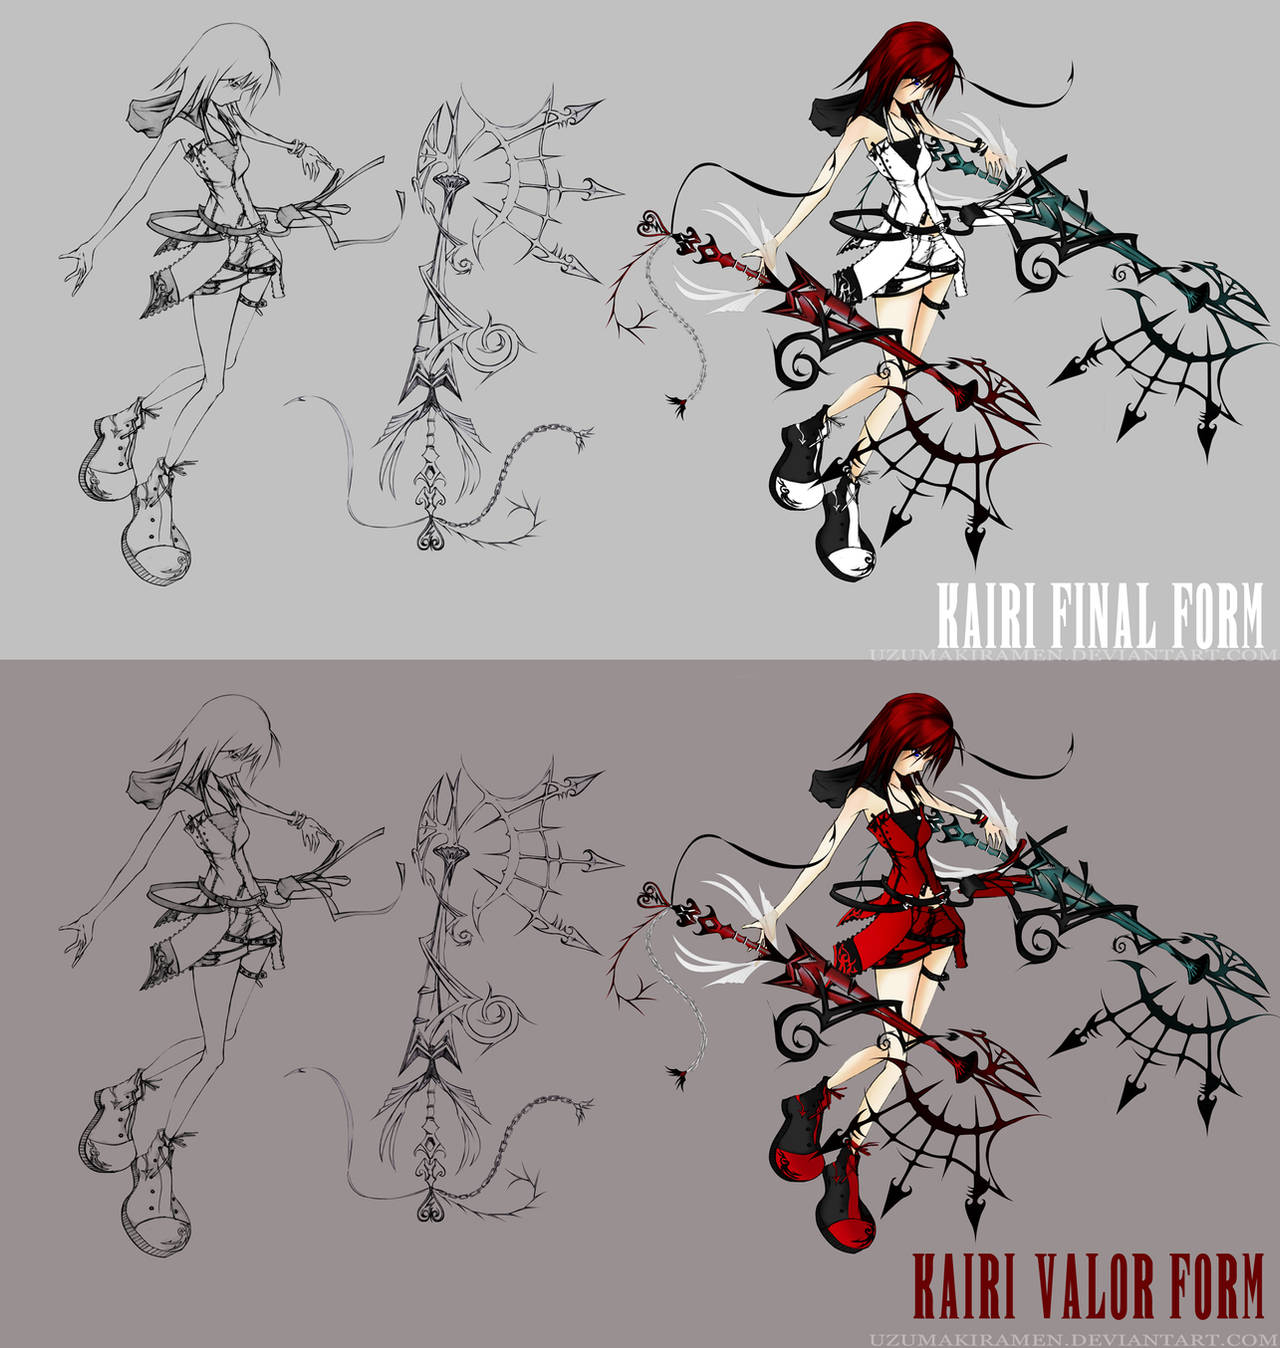 Dead Fantasy Kairi   Leave it up to me by UzumakiRamen